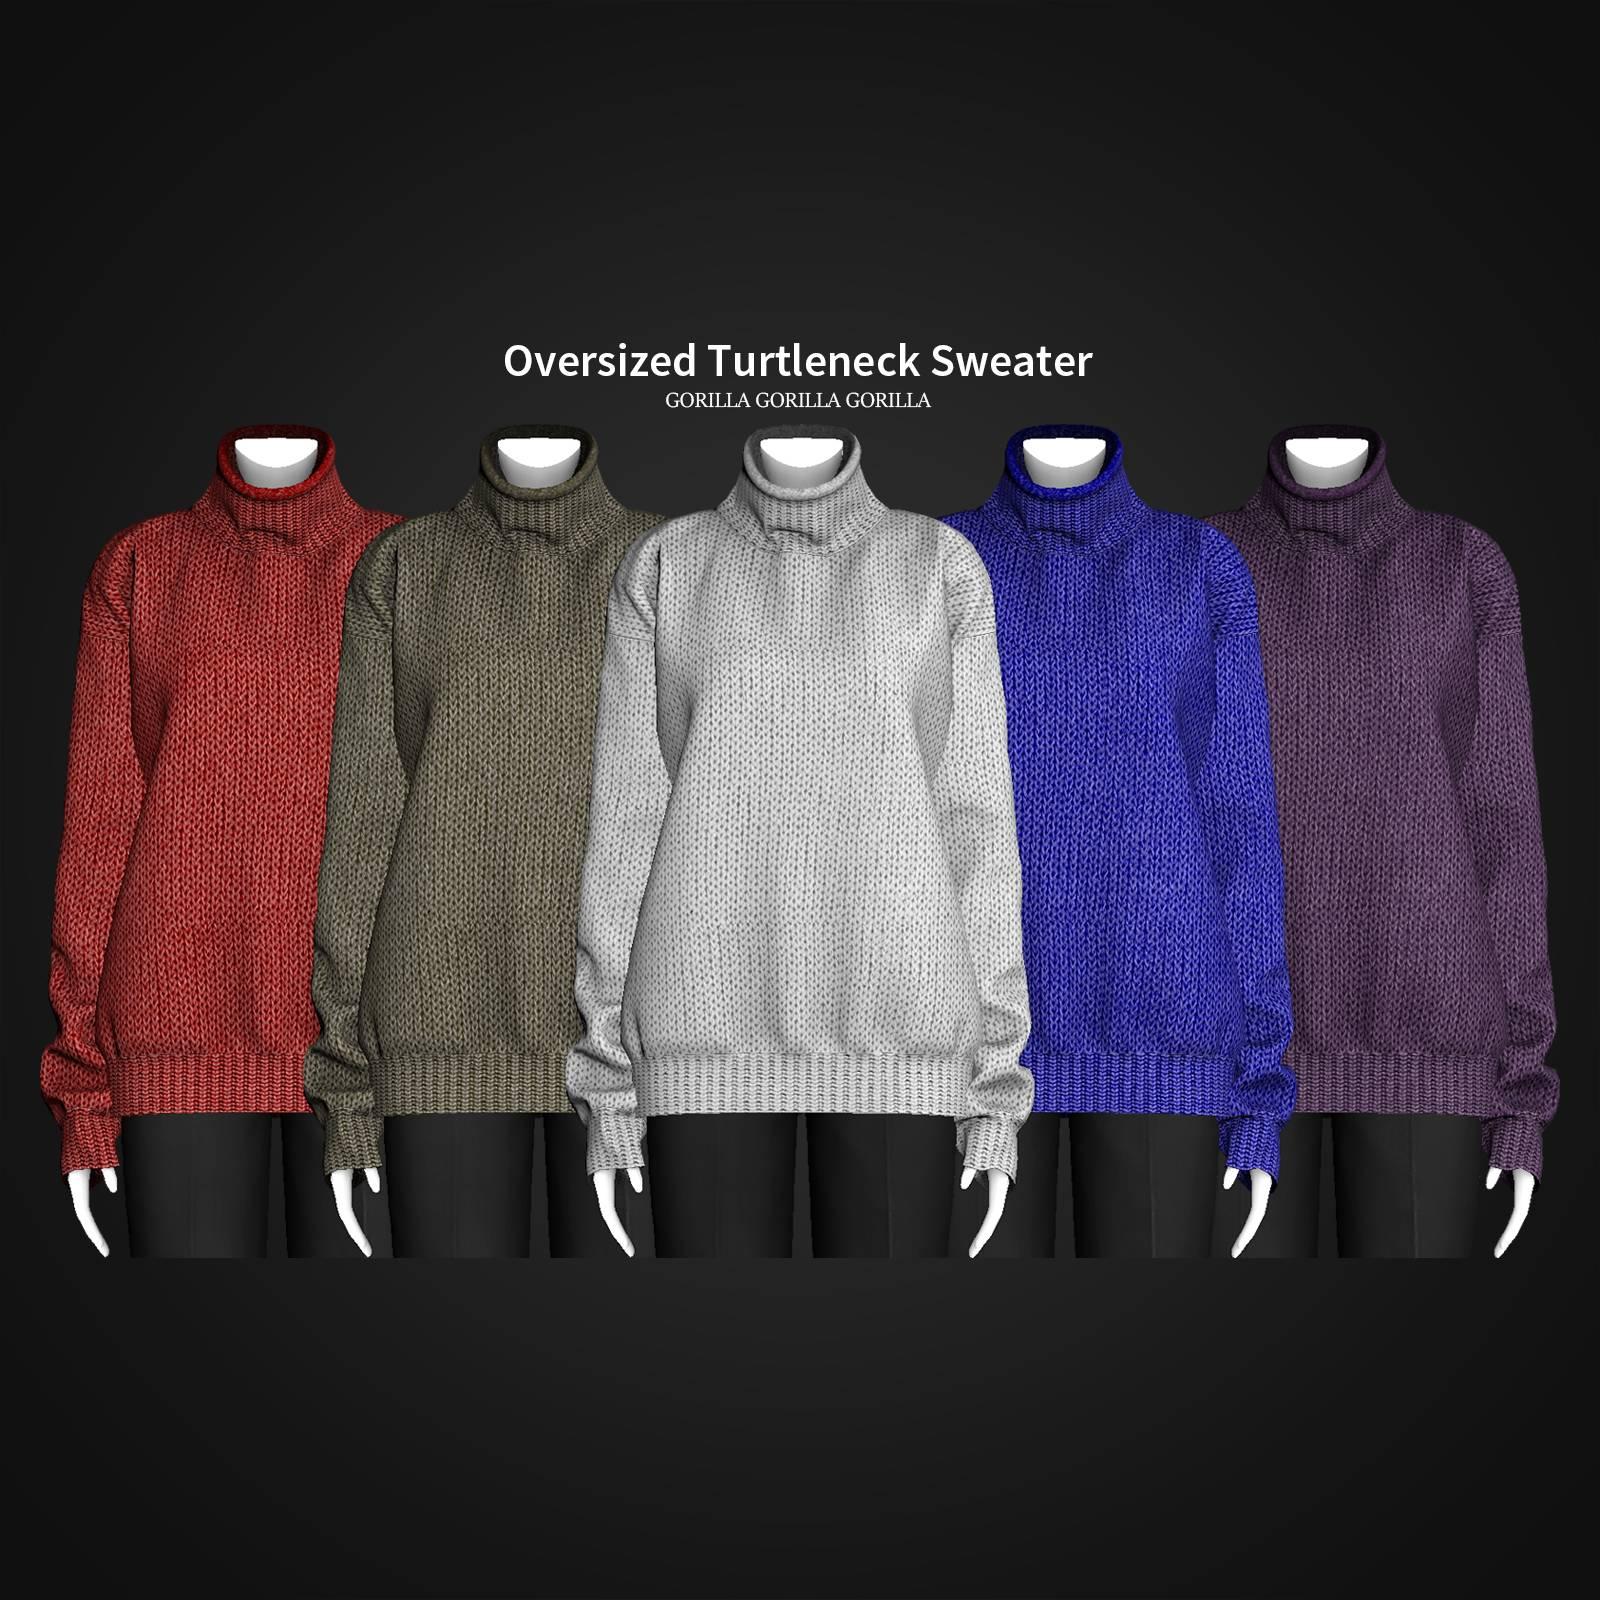 Женский свитер - Oversized Turtleneck Sweater